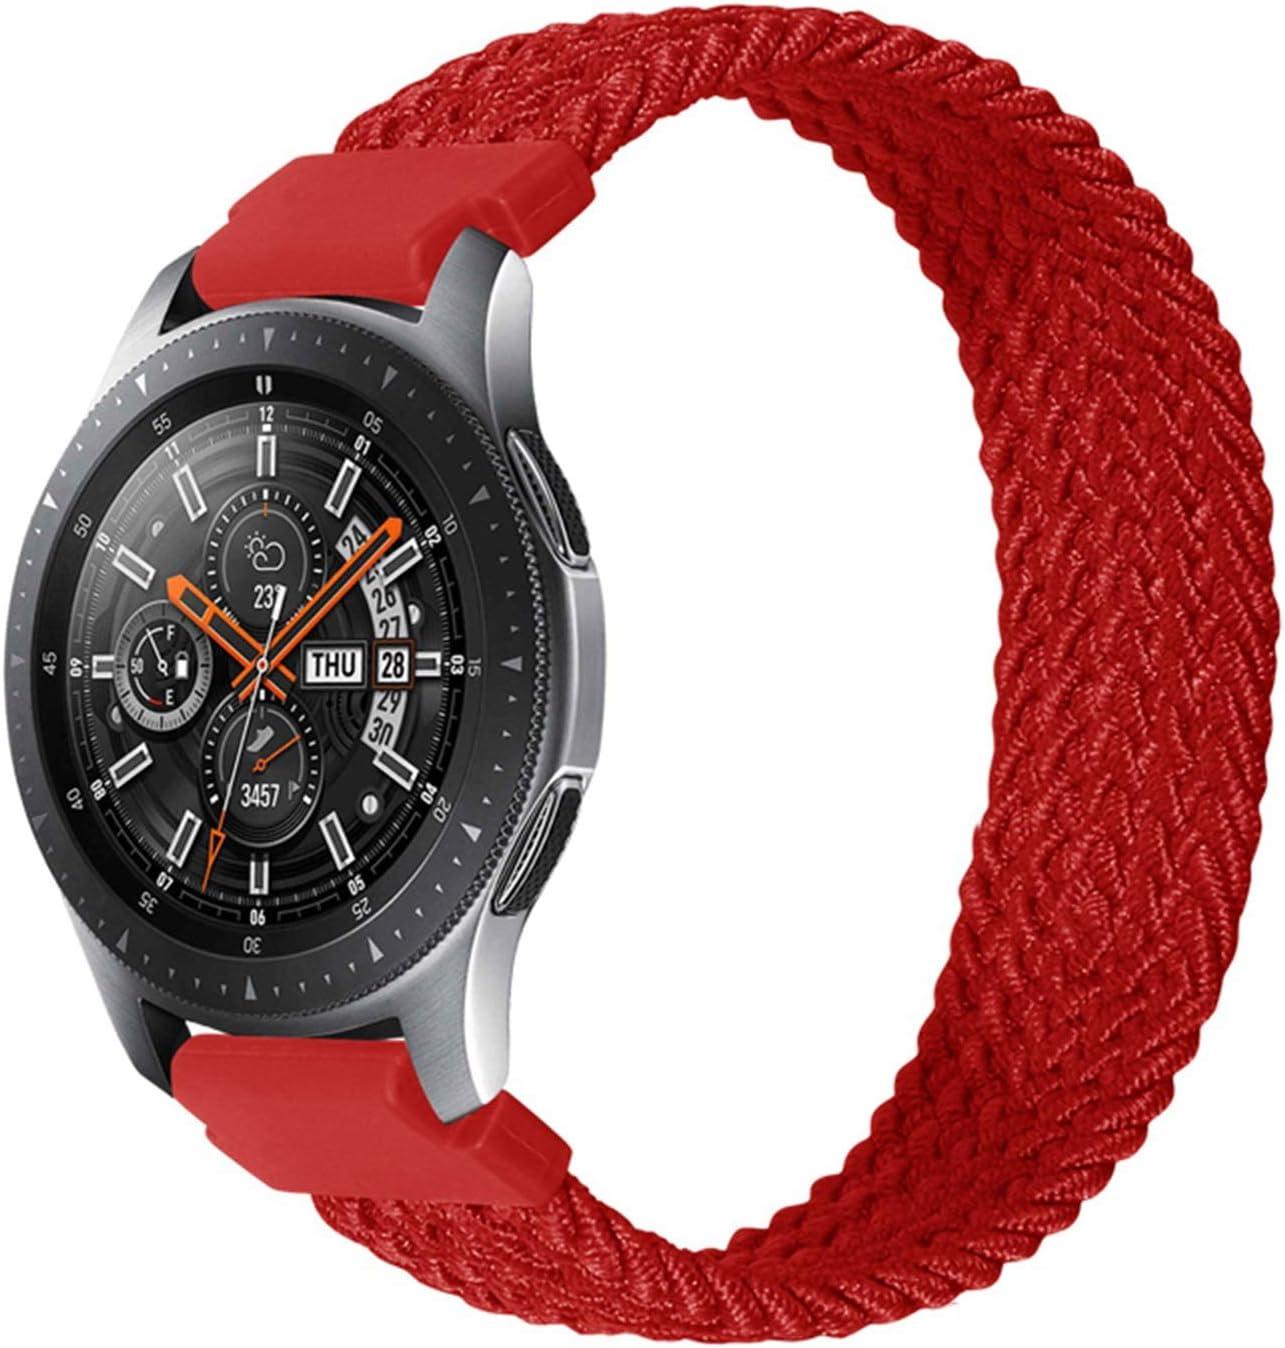 LJSKAFF 22mm 20mm Solo Loop Watch Galaxy Band Max 54% OFF Strap for Samsung Over item handling ☆